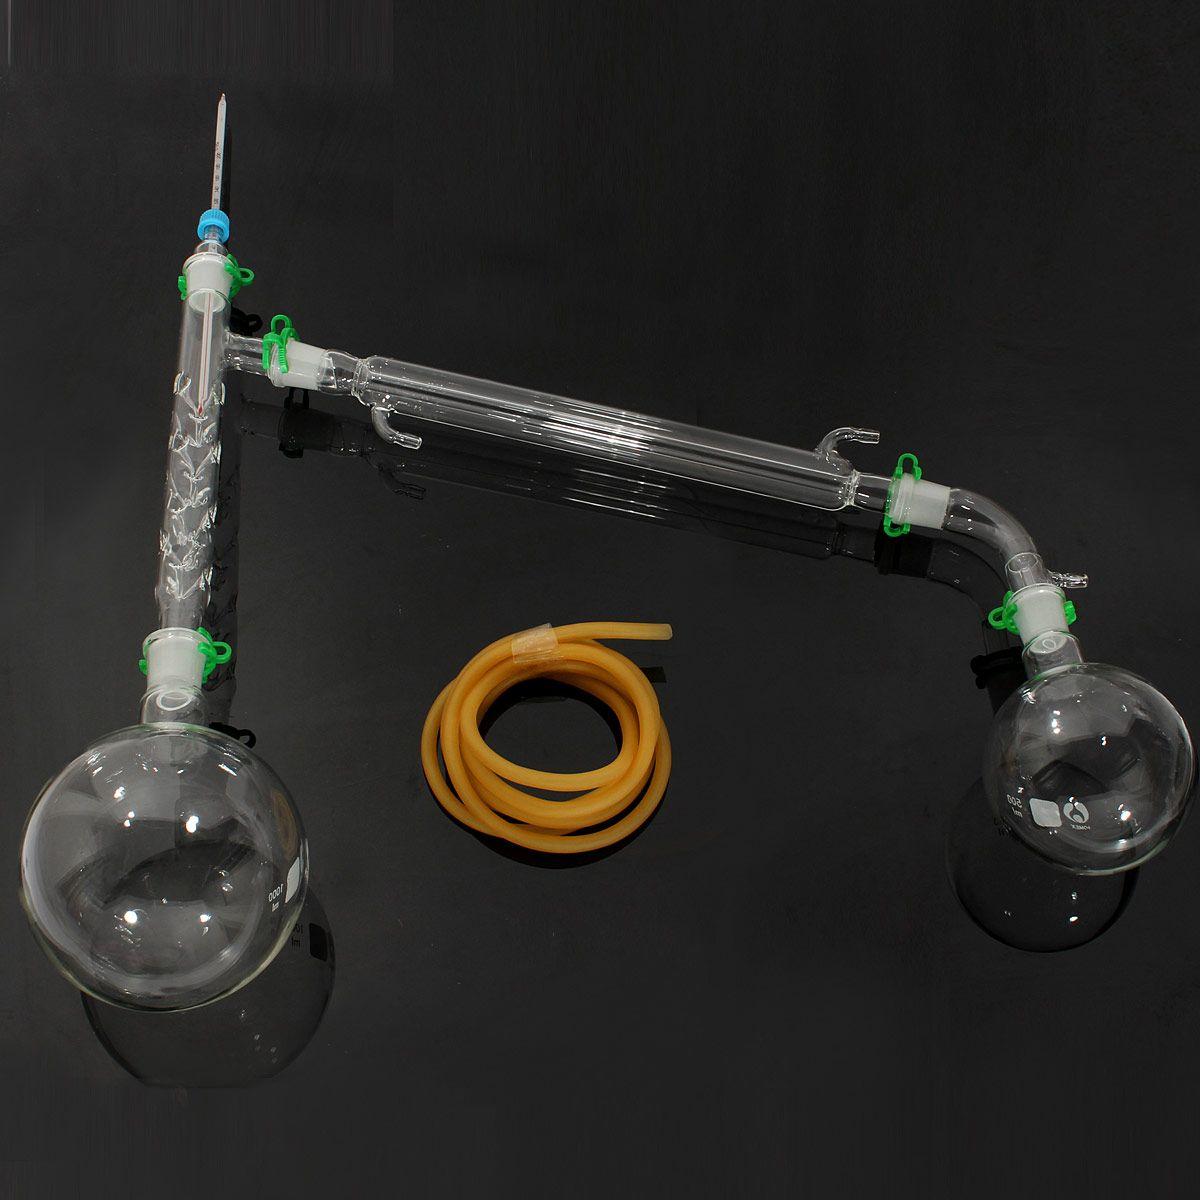 1000 ml Destillation Gerät Labor Chemie Glaswaren Kit Set Chemie Labor Glas Destillation Destillation Gerät 24/29